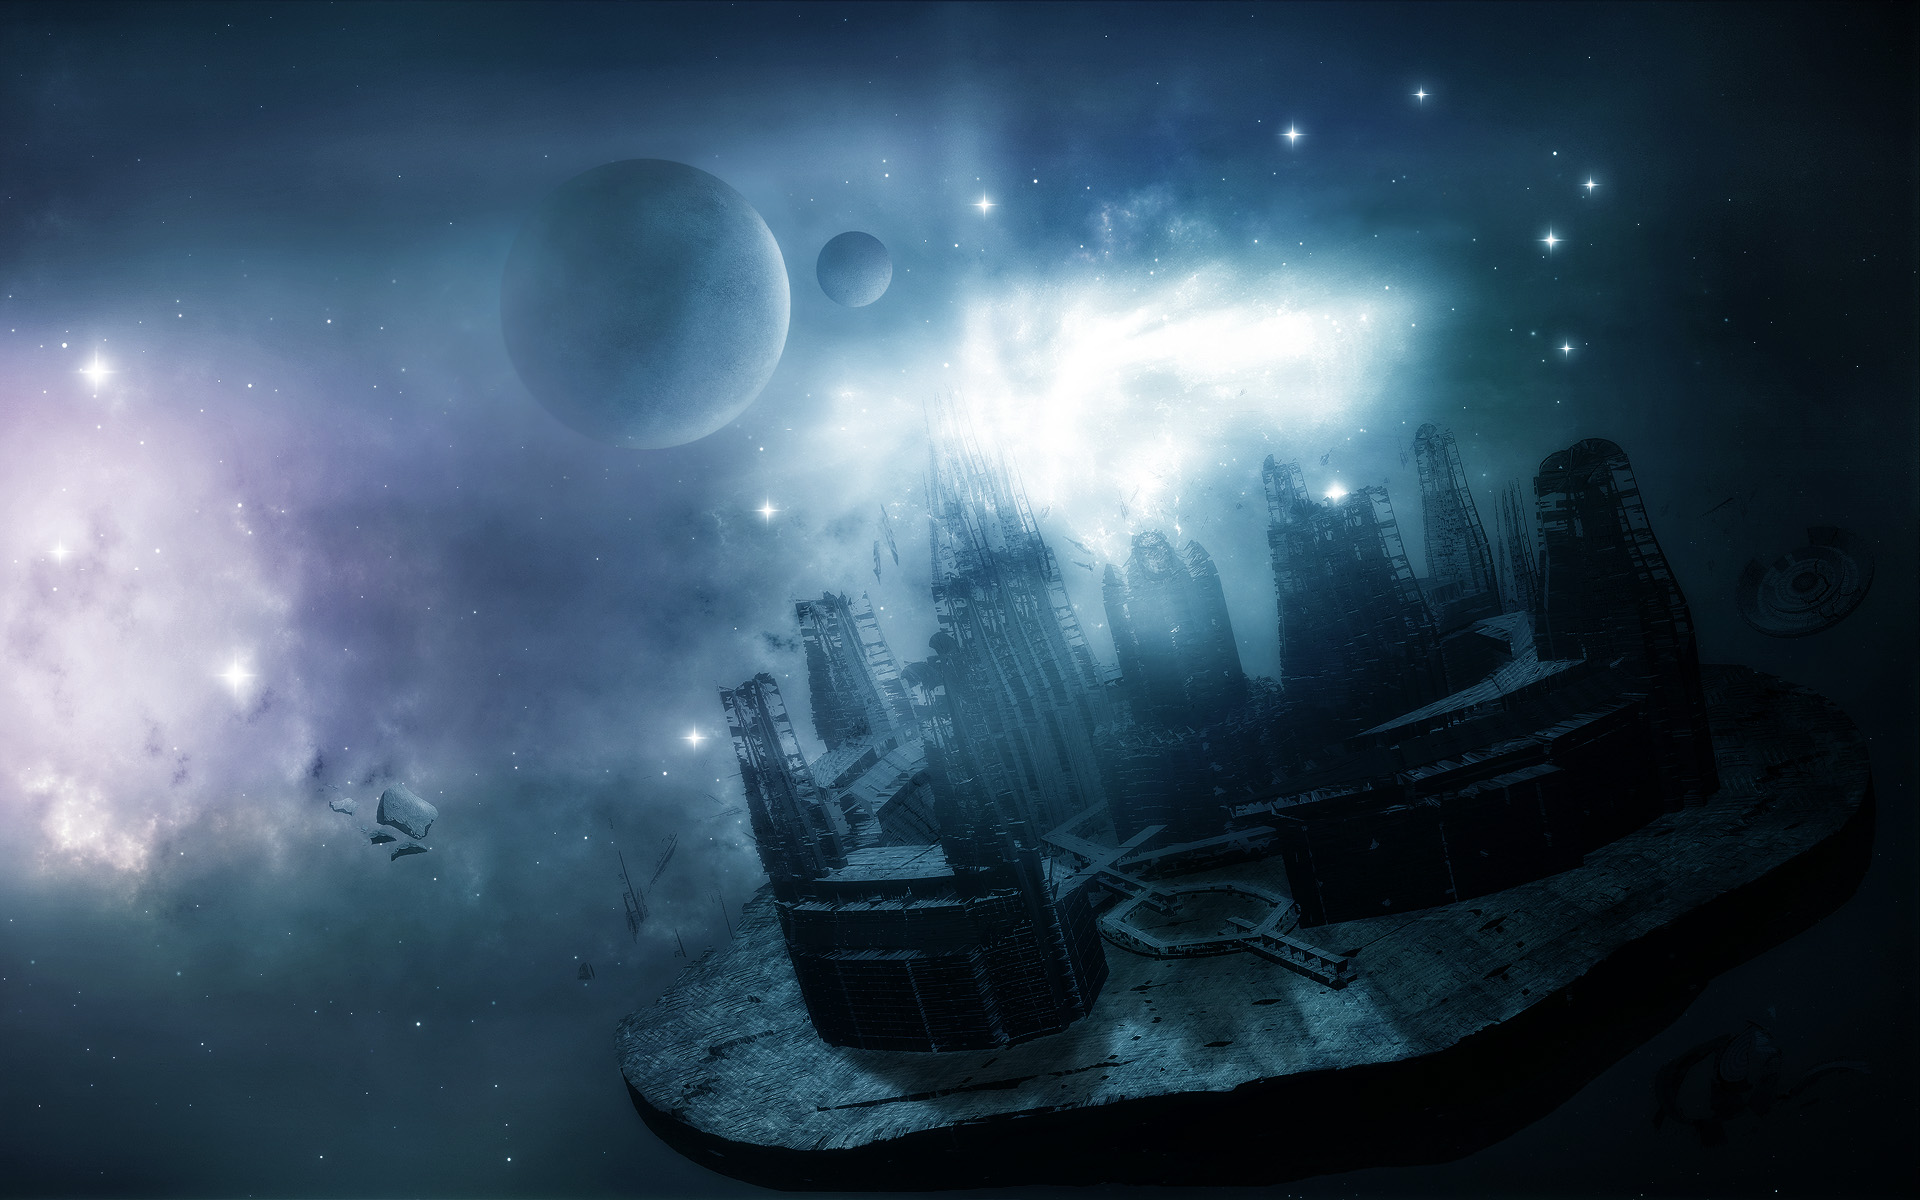 Of Odyssey spaceship future desktop wallpaper background screensaver 1920x1200